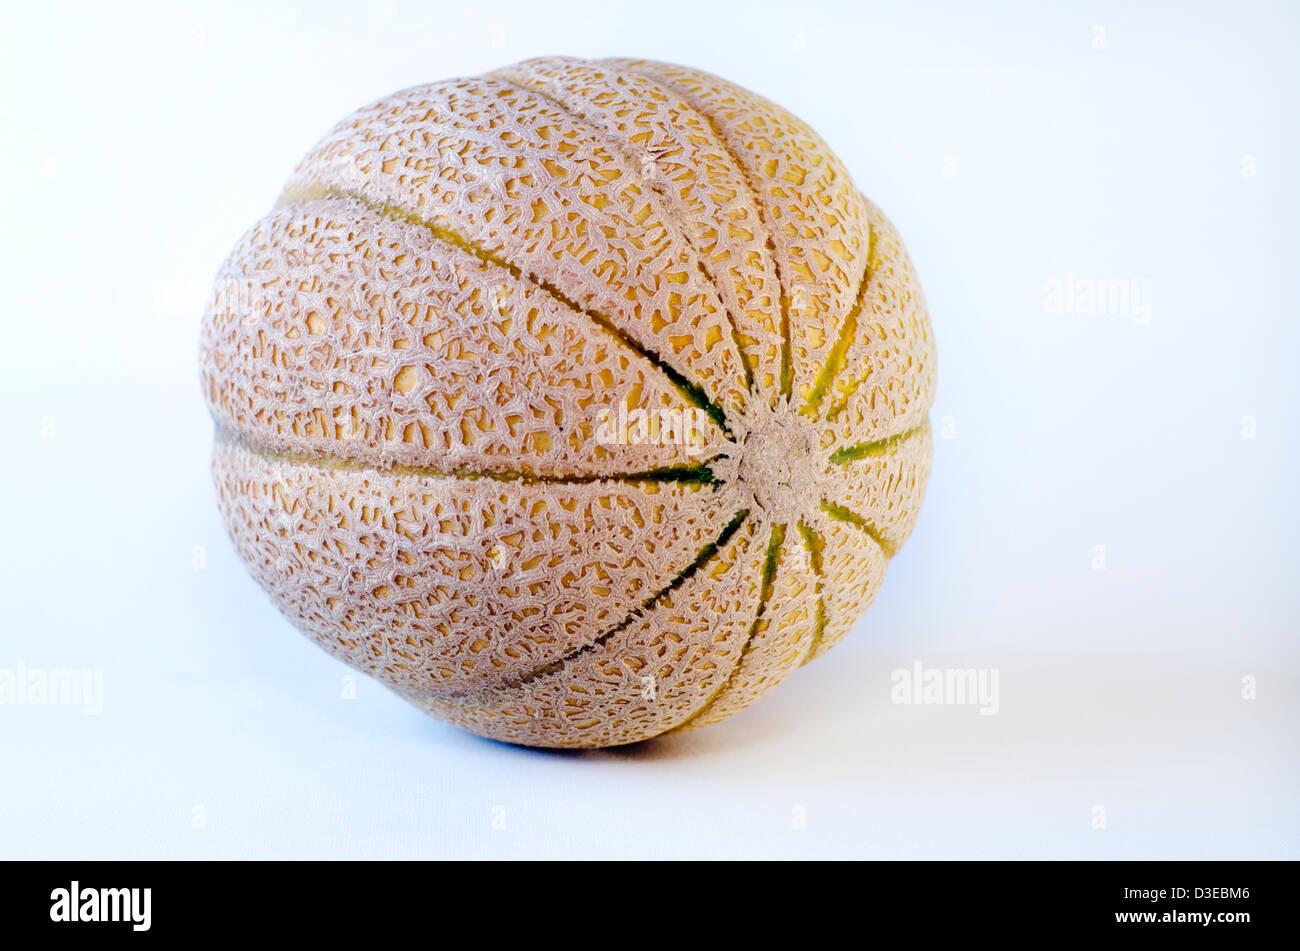 Cantaloupe melon isolated on a white background. - Stock Image